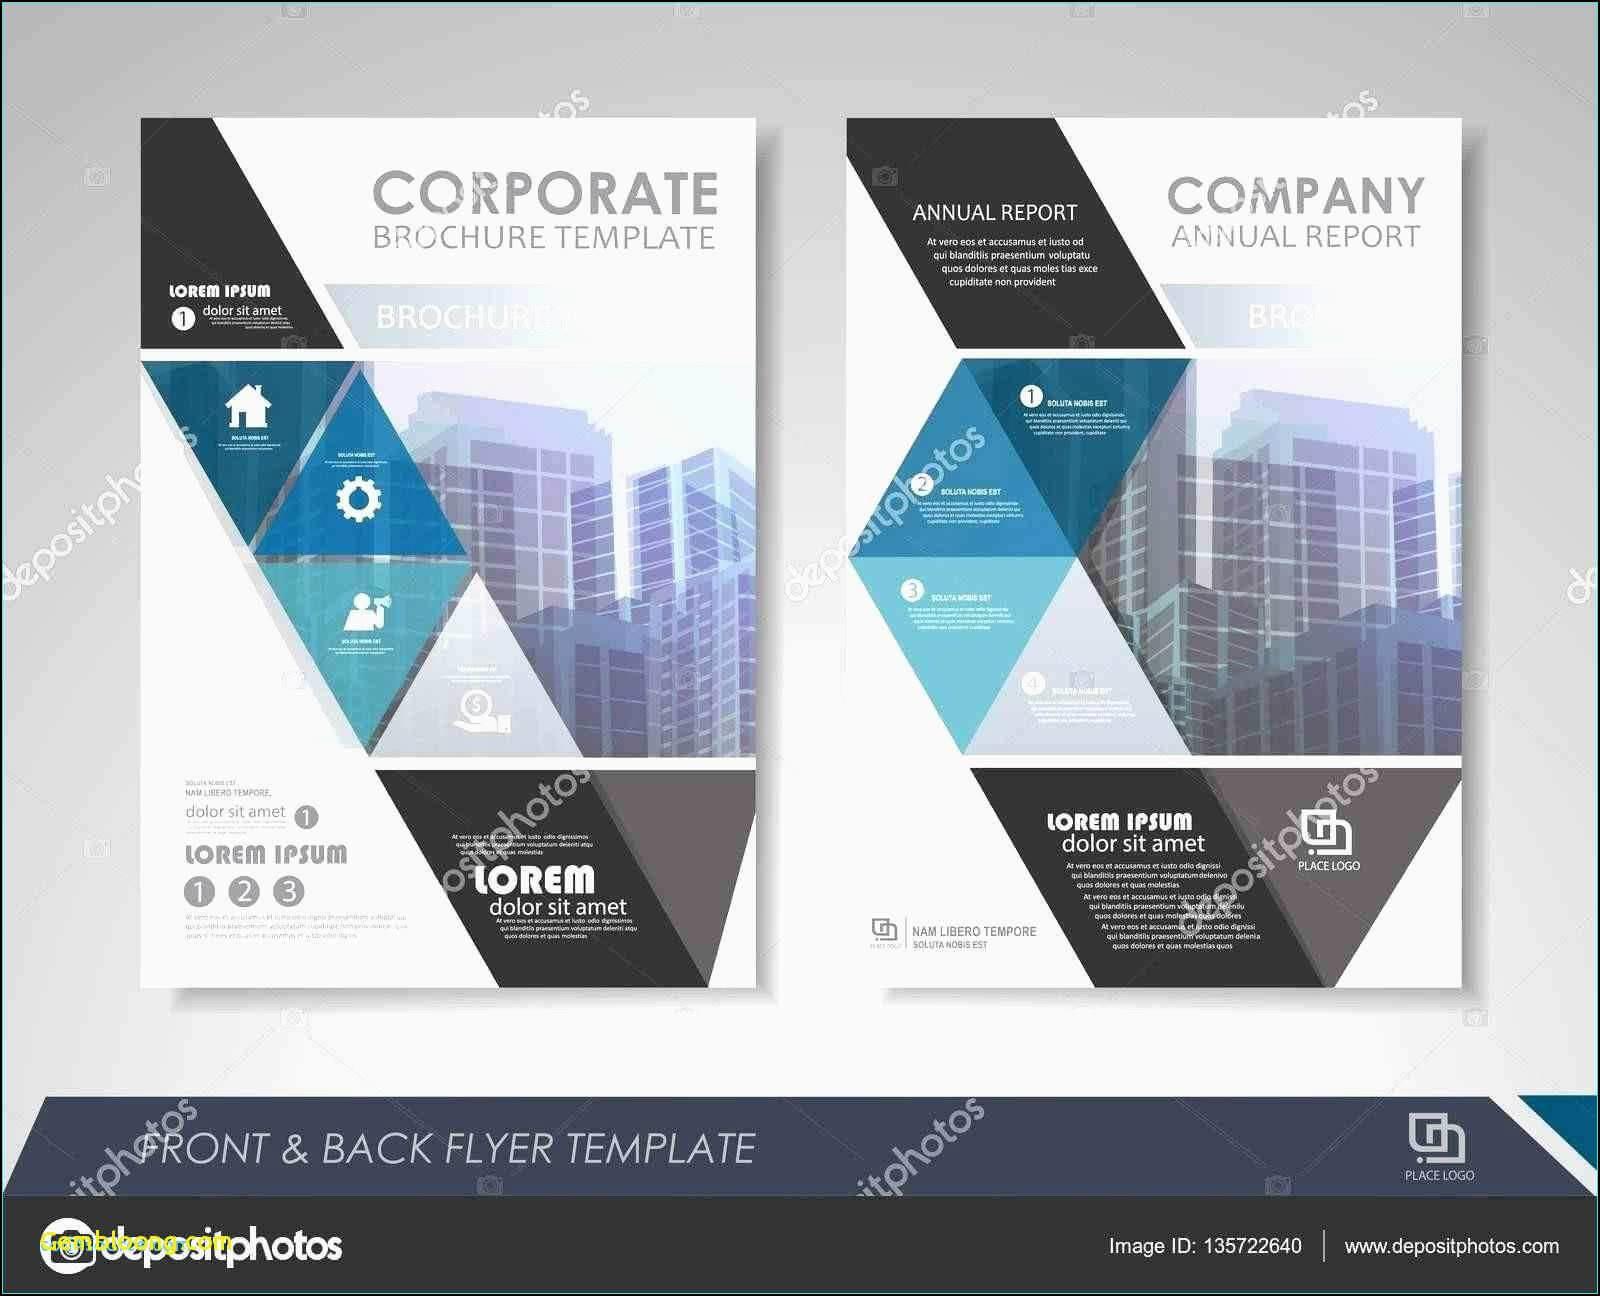 Unique 28 A4 Tri Fold Brochure Template Psd Free Download throughout Brochure Templates Free Download Indesign